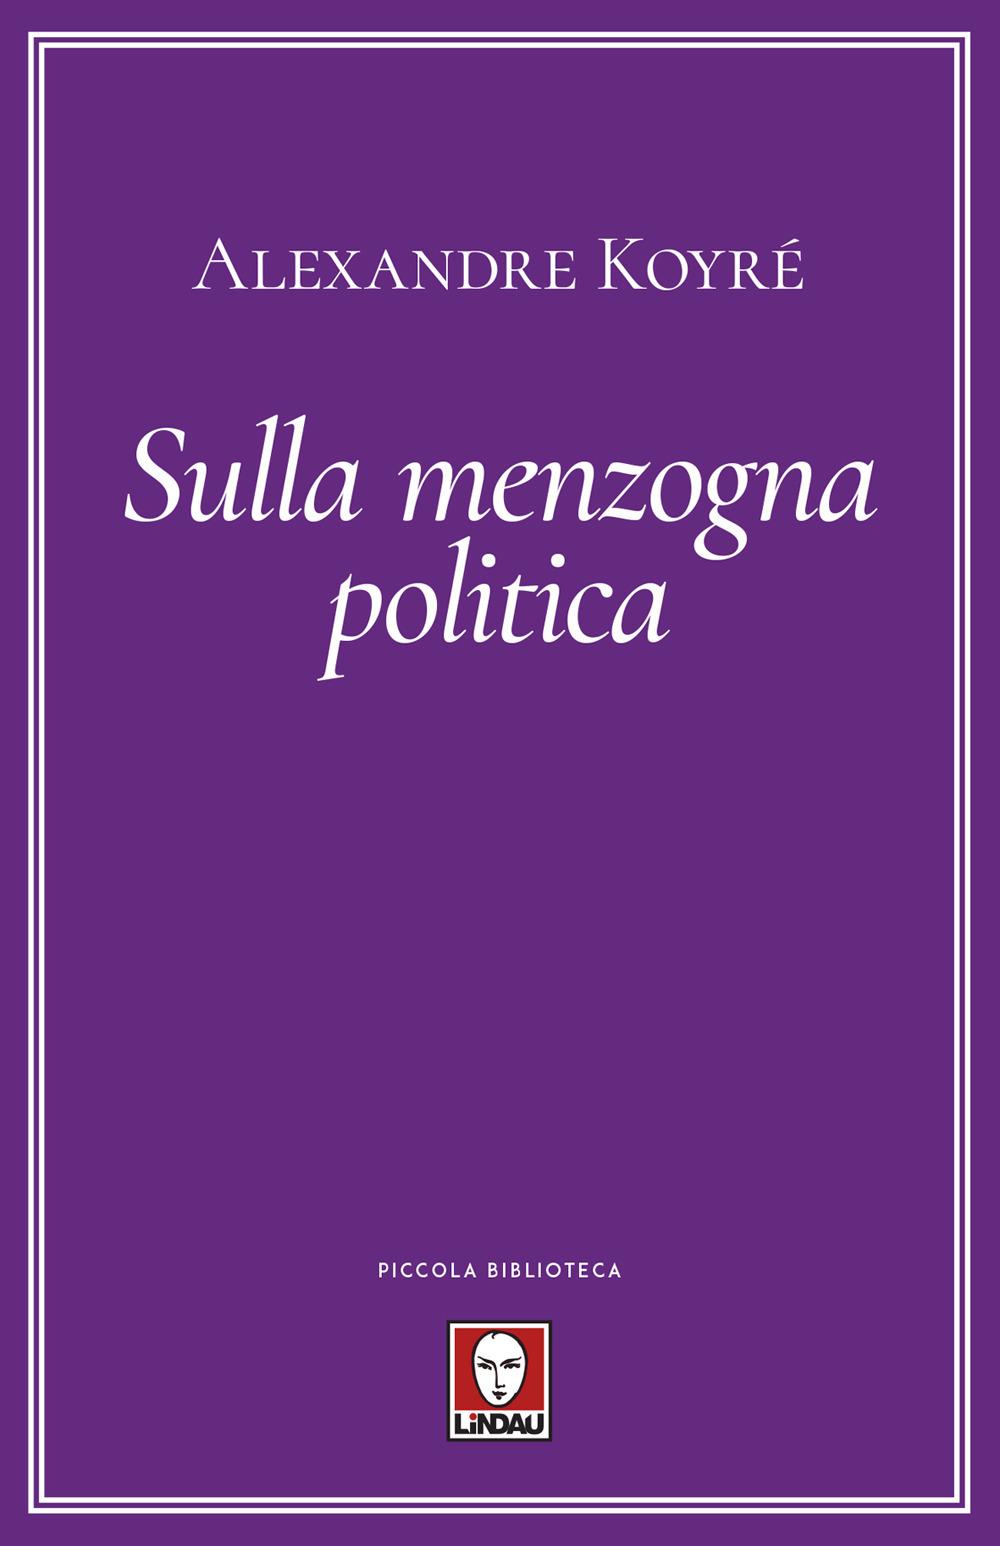 SULLA MENZOGNA POLITICA - Koyré Alexandre; Tarditi C. (cur.) - 9788833534763